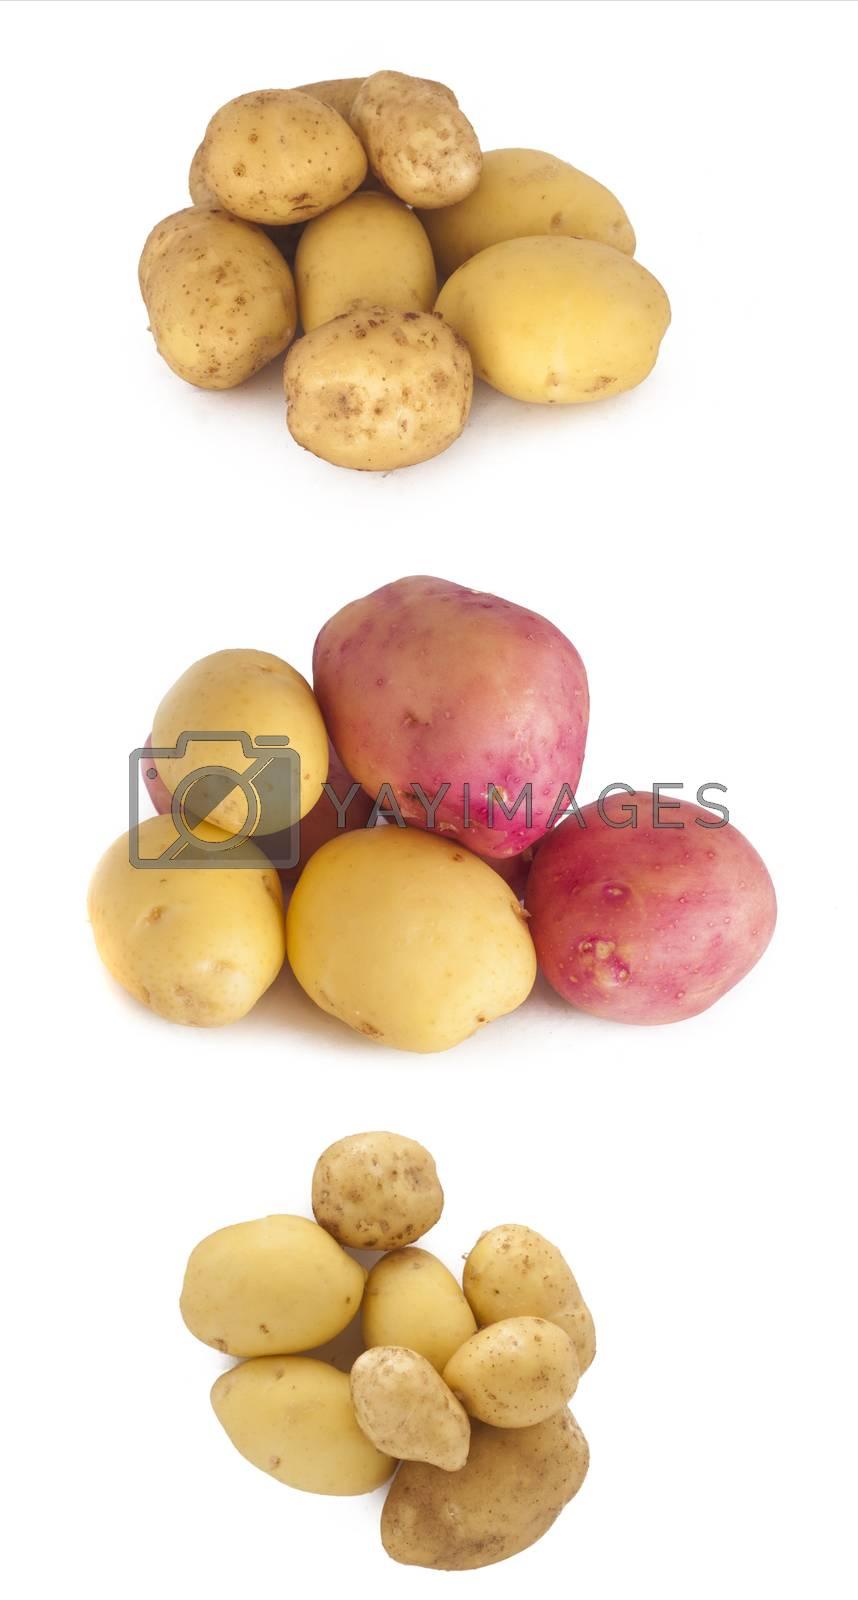 Potato by Almir